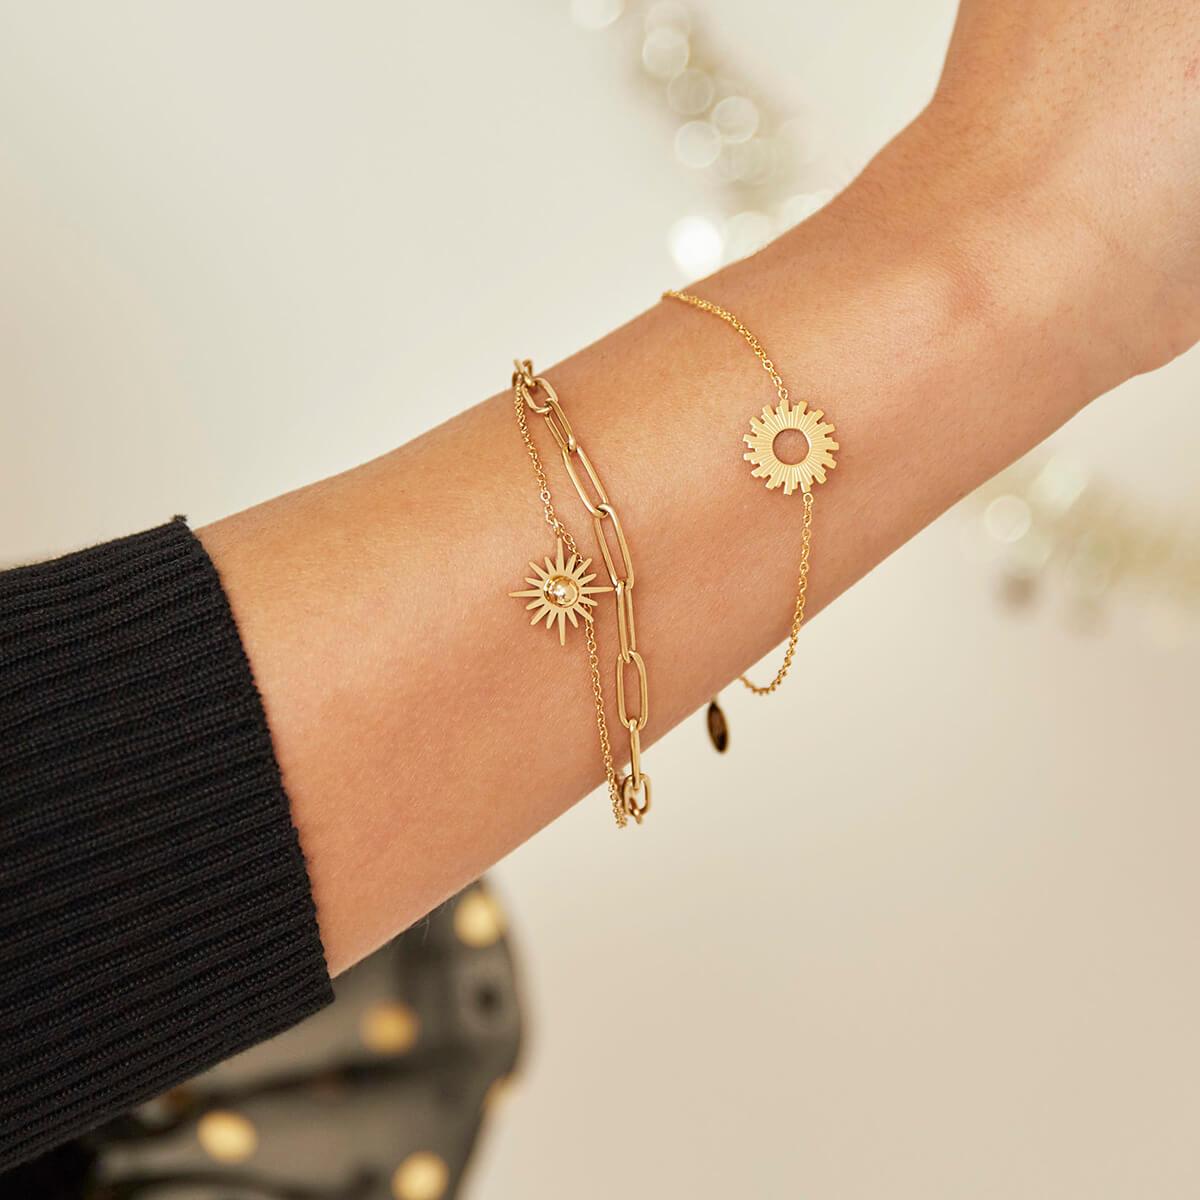 Bracelet soleil - bracelet chaine mode - Sunny - Cénélia